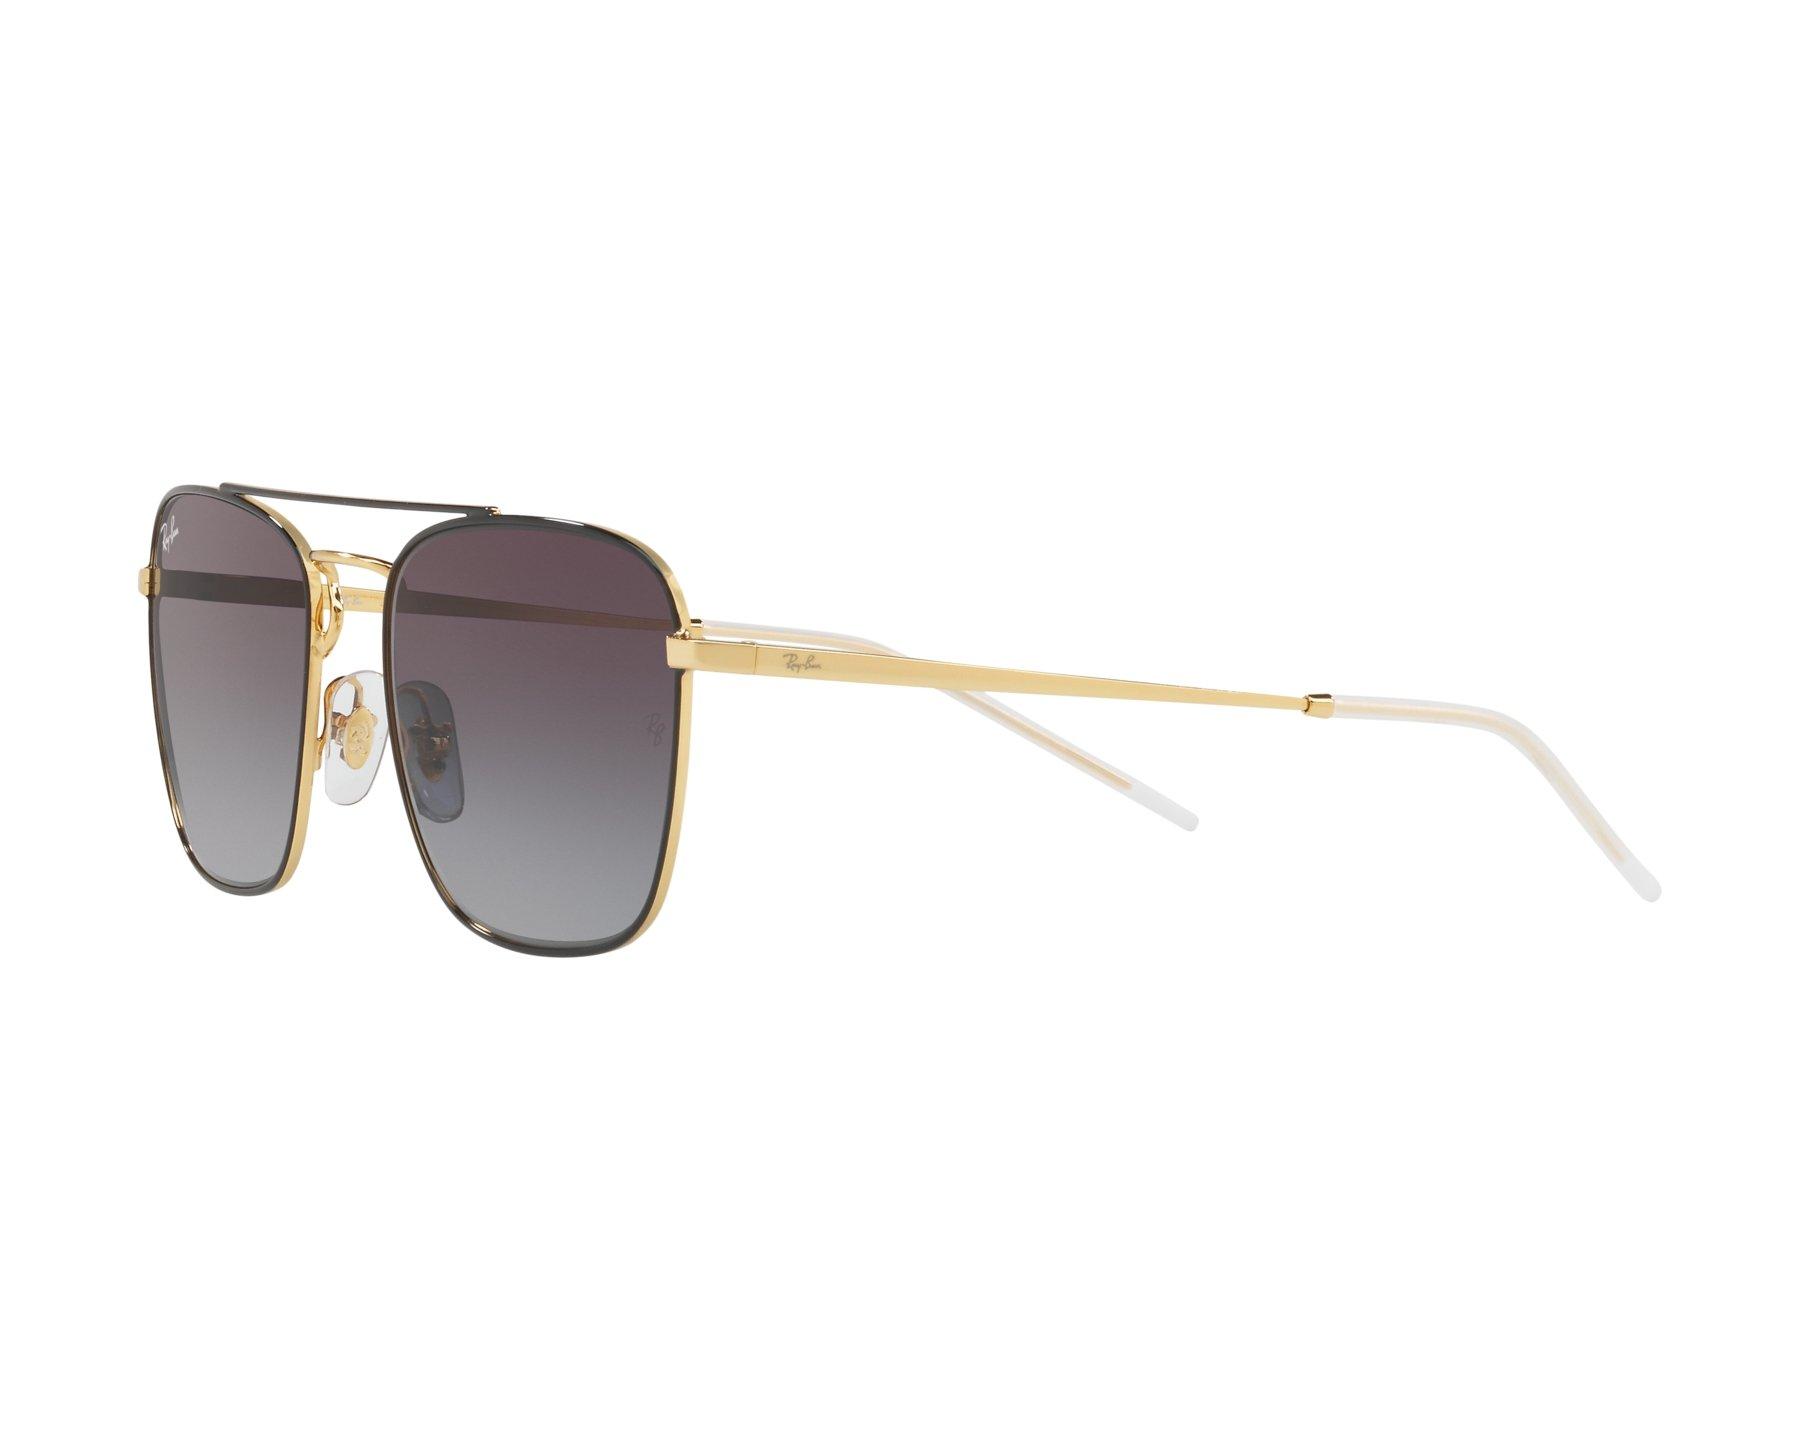 70c623ca02 Sunglasses Ray-Ban RB-3588 90548G 55-19 Black Gold 360 degree view